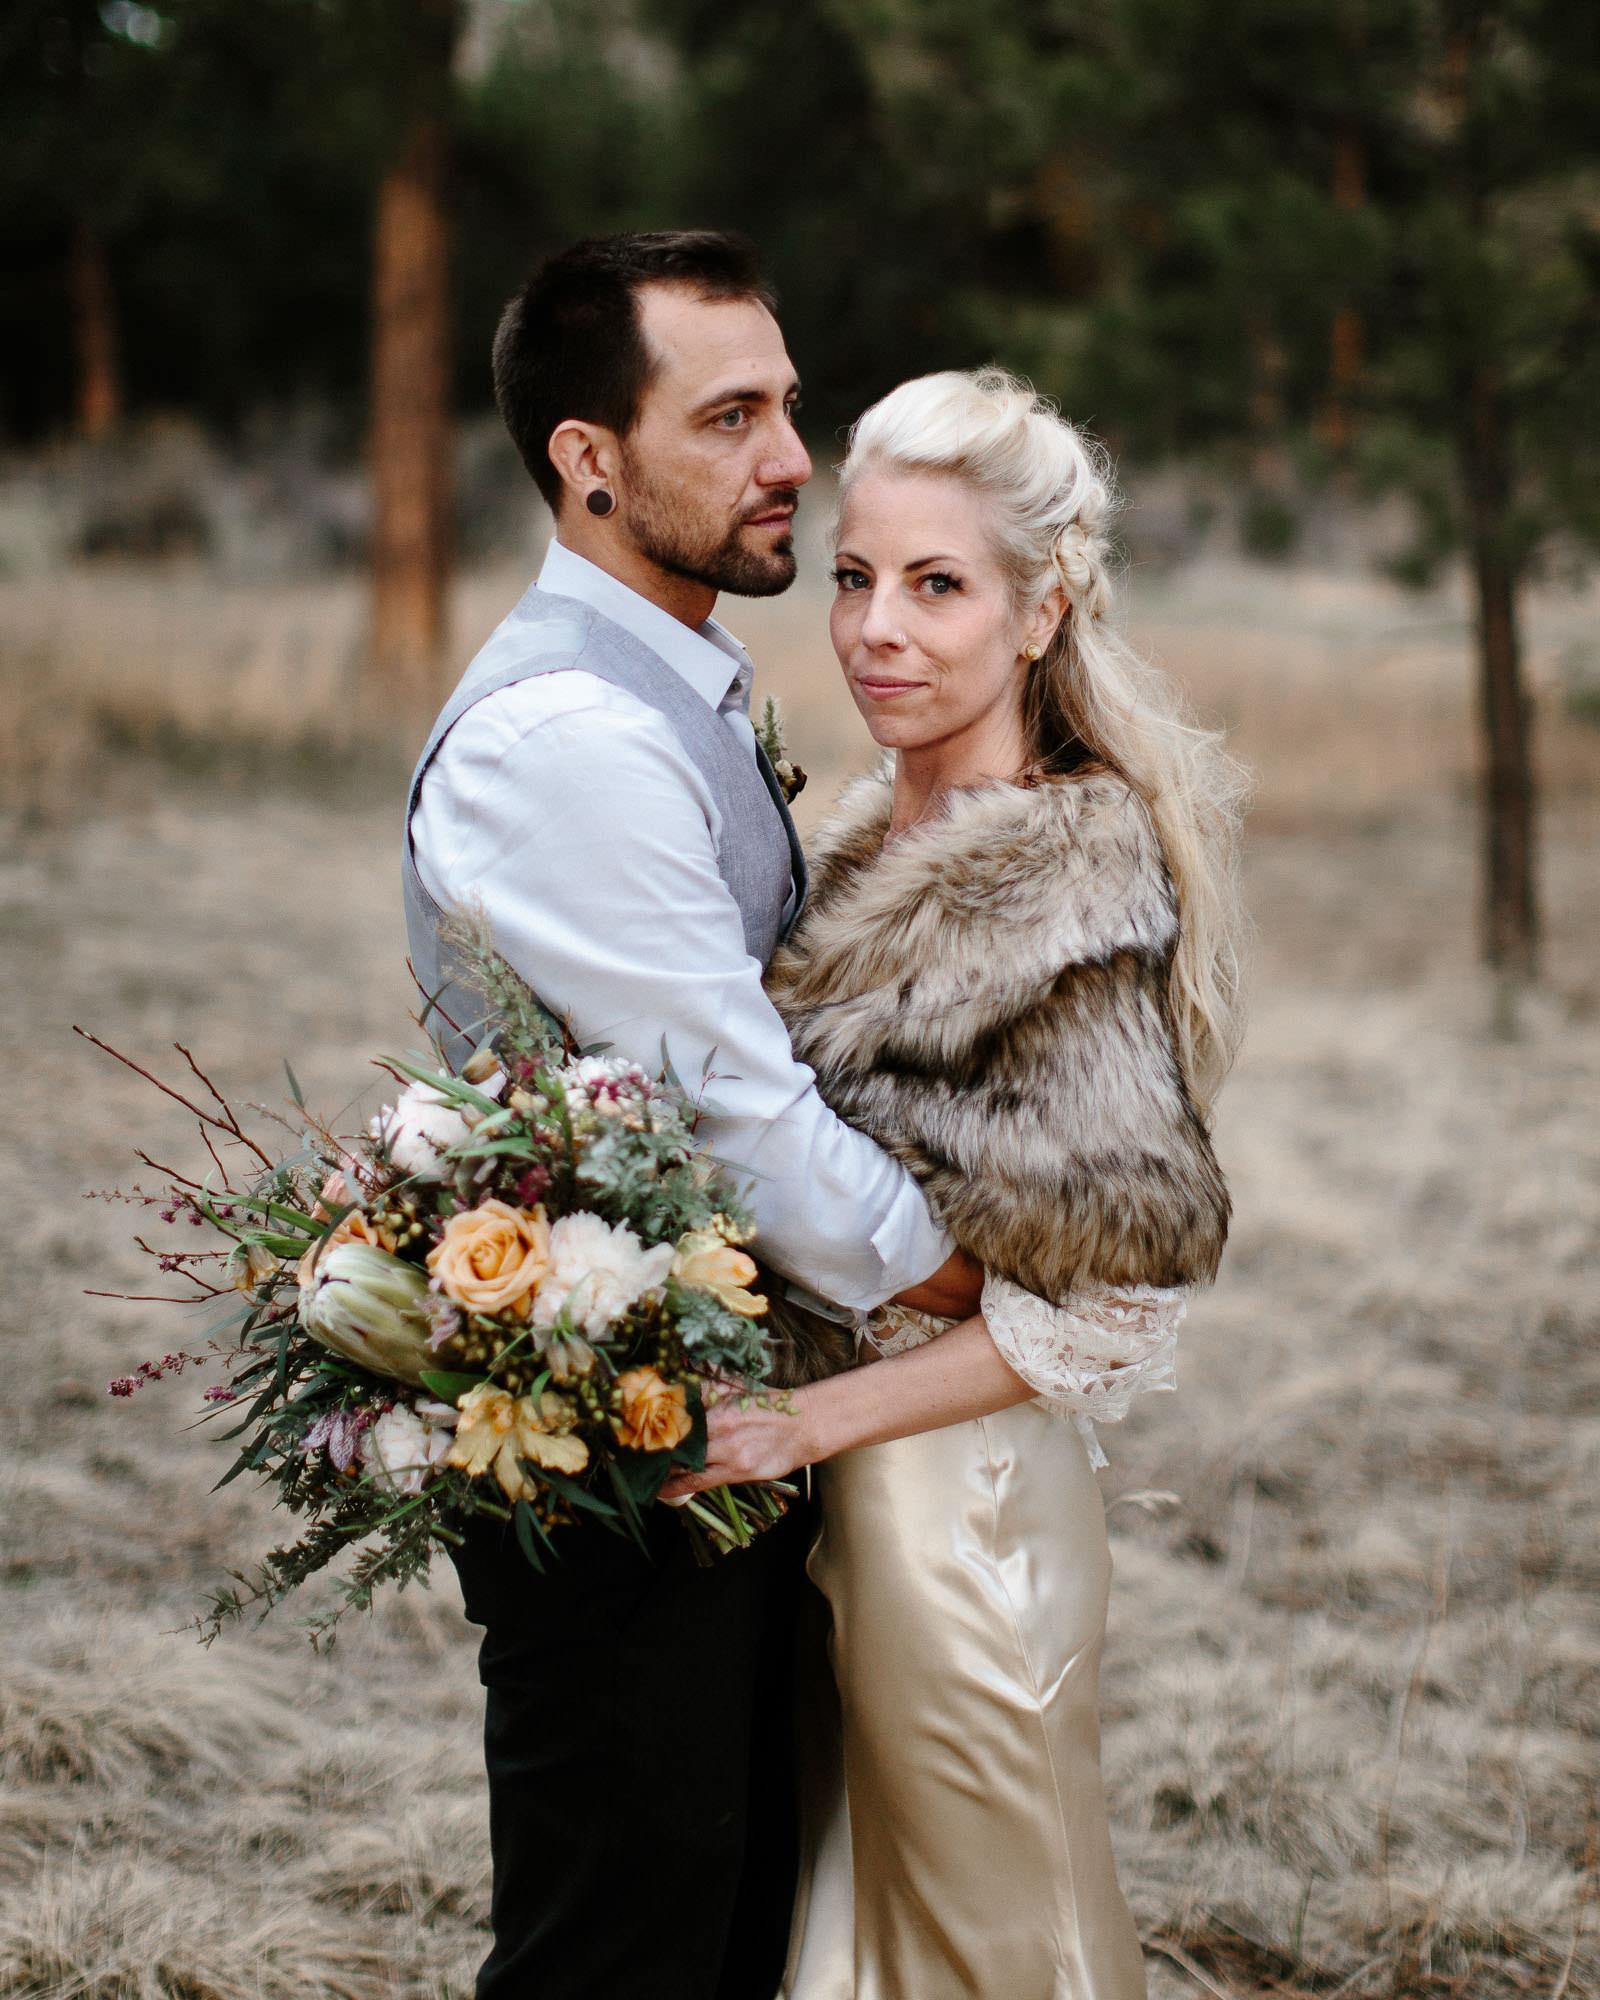 bucci-barn-wedding-elopement-evergreen-boulder-denver-colorado-adventerous-romantic-timeless-086.jpg